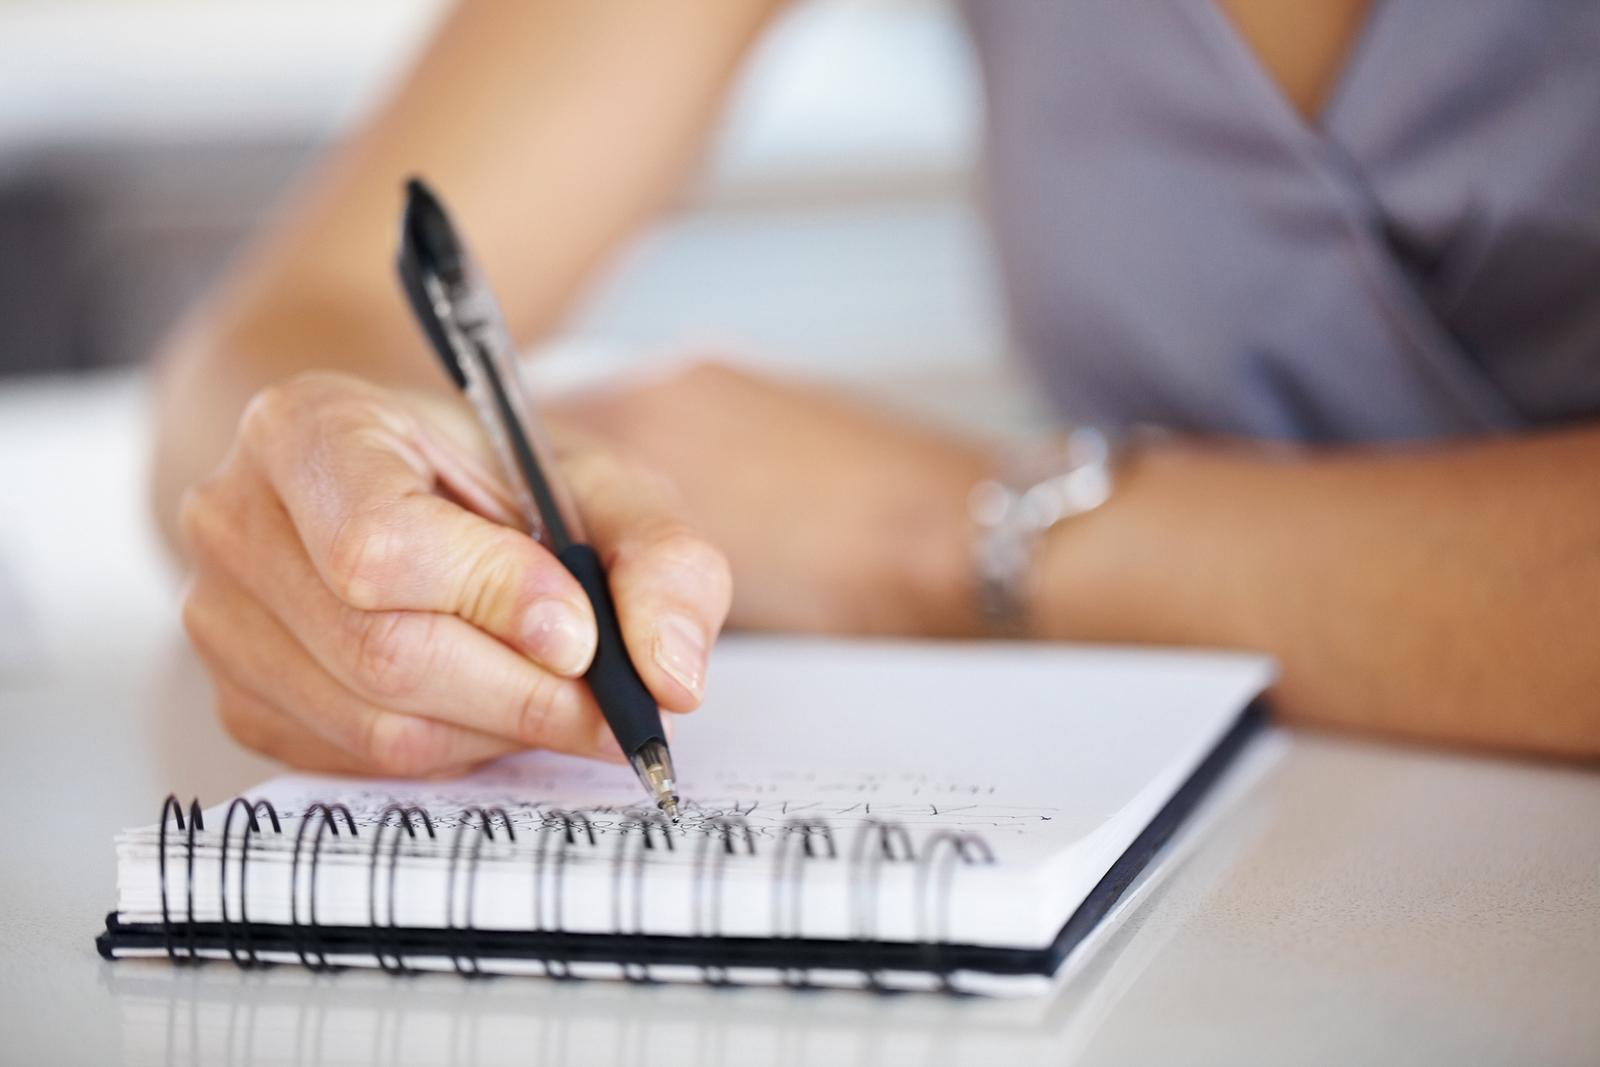 Дневник самоконтроля диабетика. Как вести дневник при сахарном диабете?